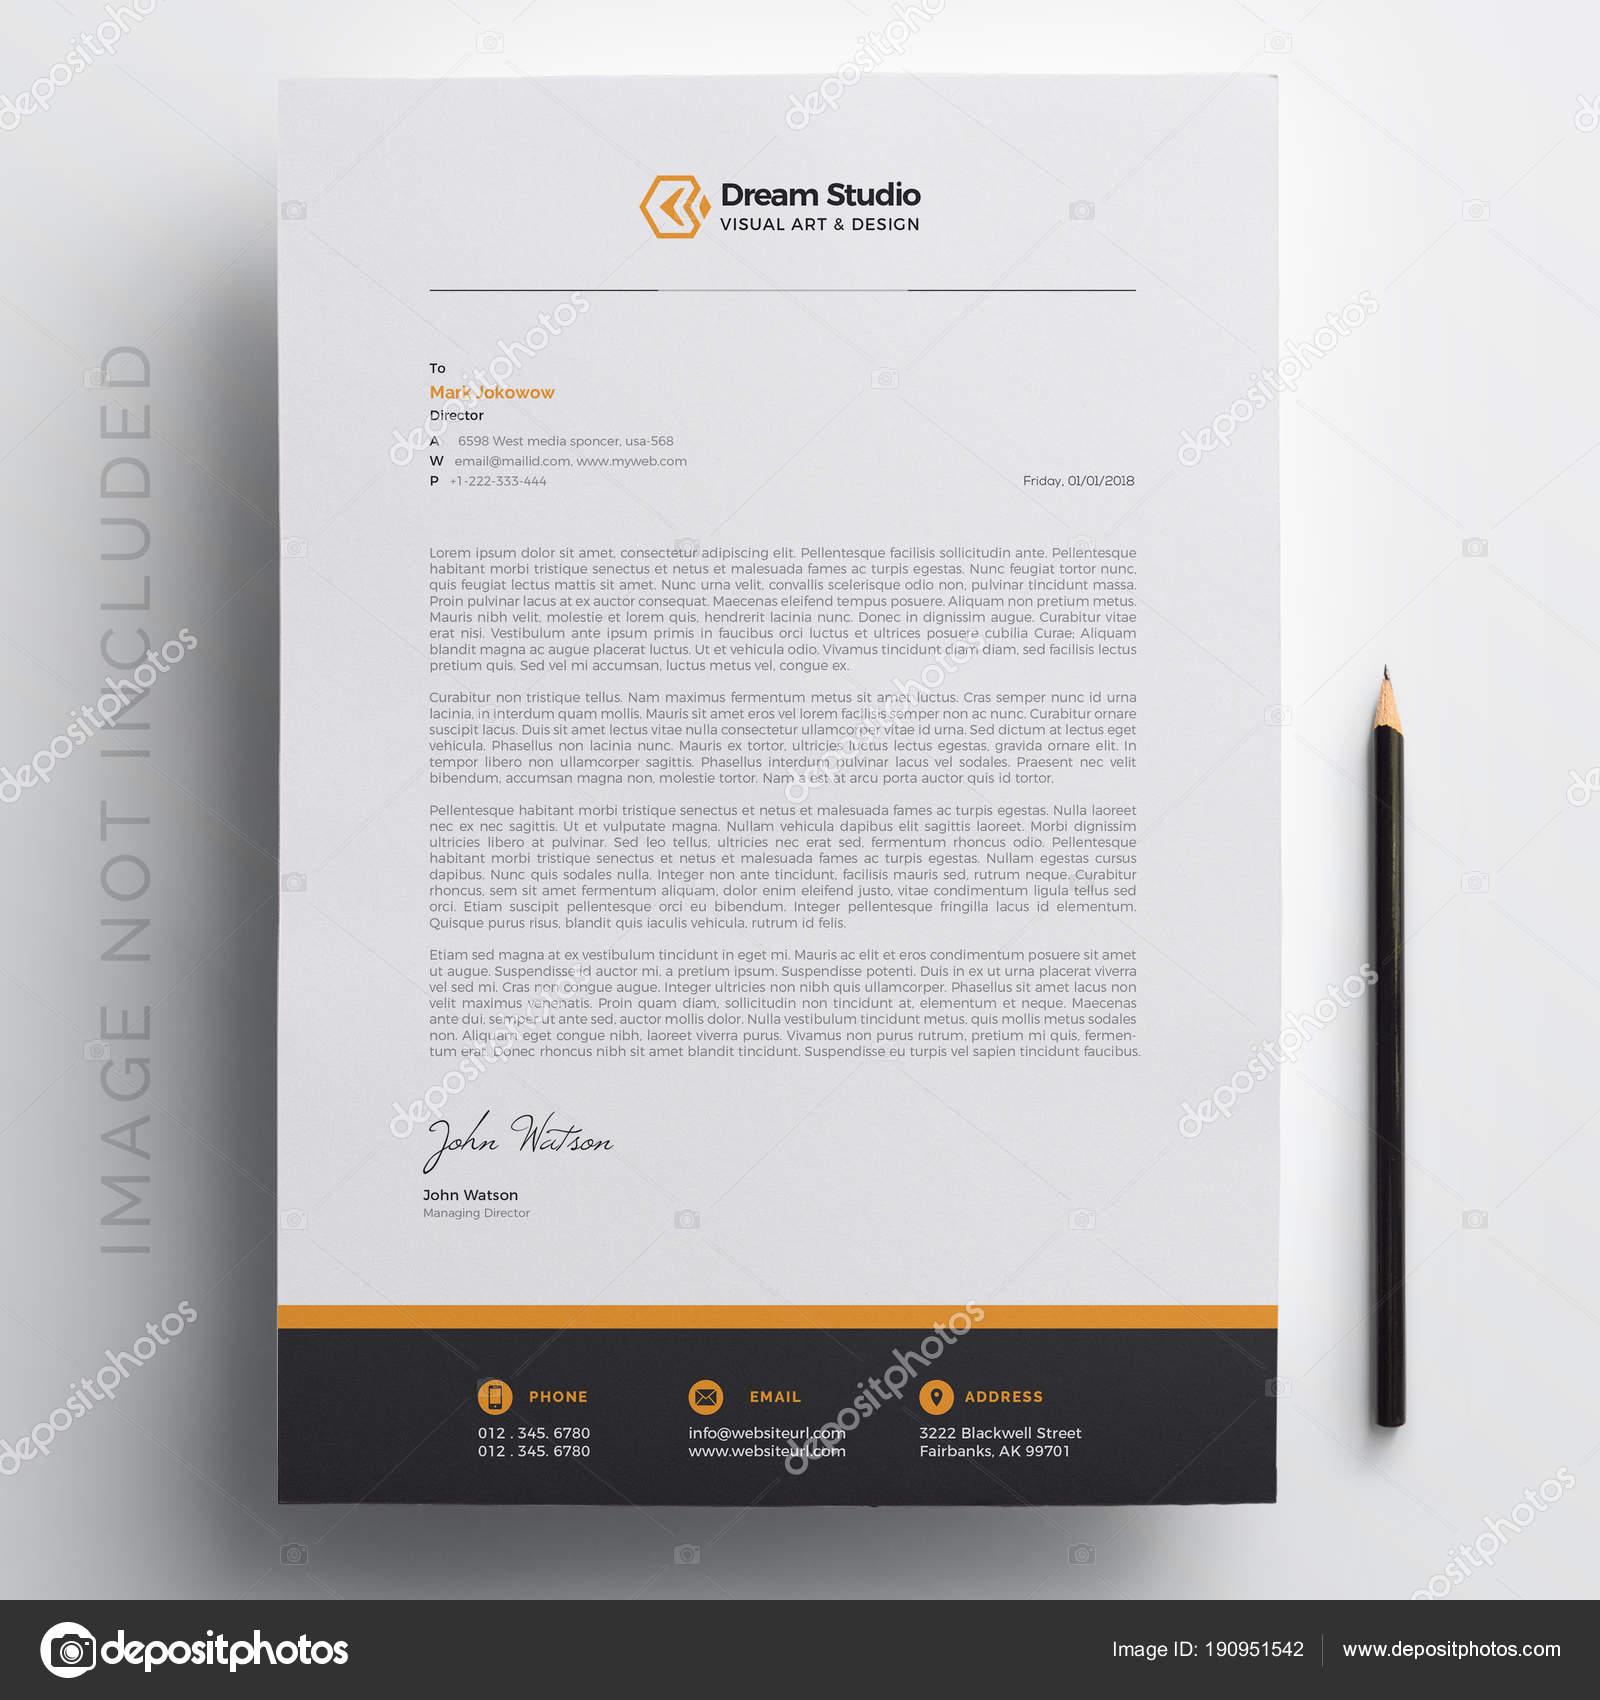 Modernes Unternehmen Briefkopf Vorlage Stockvektor Dreamstudio